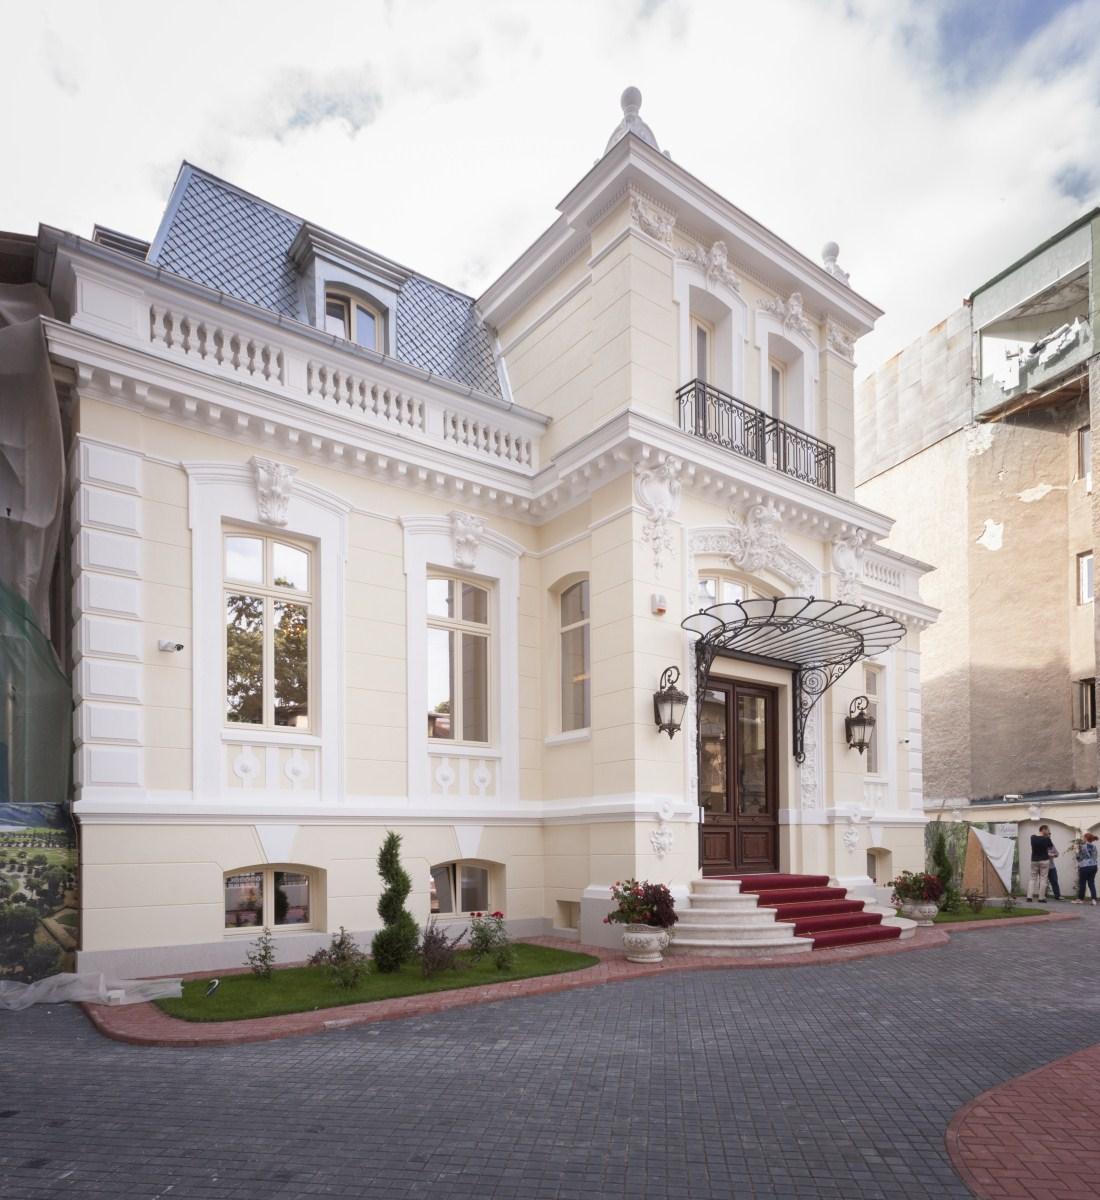 https://nbc-arhitect.ro/wp-content/uploads/2020/10/NBC-Arhitect-_-restorations-_-Sfintilor-House-_-Romania_6.jpg